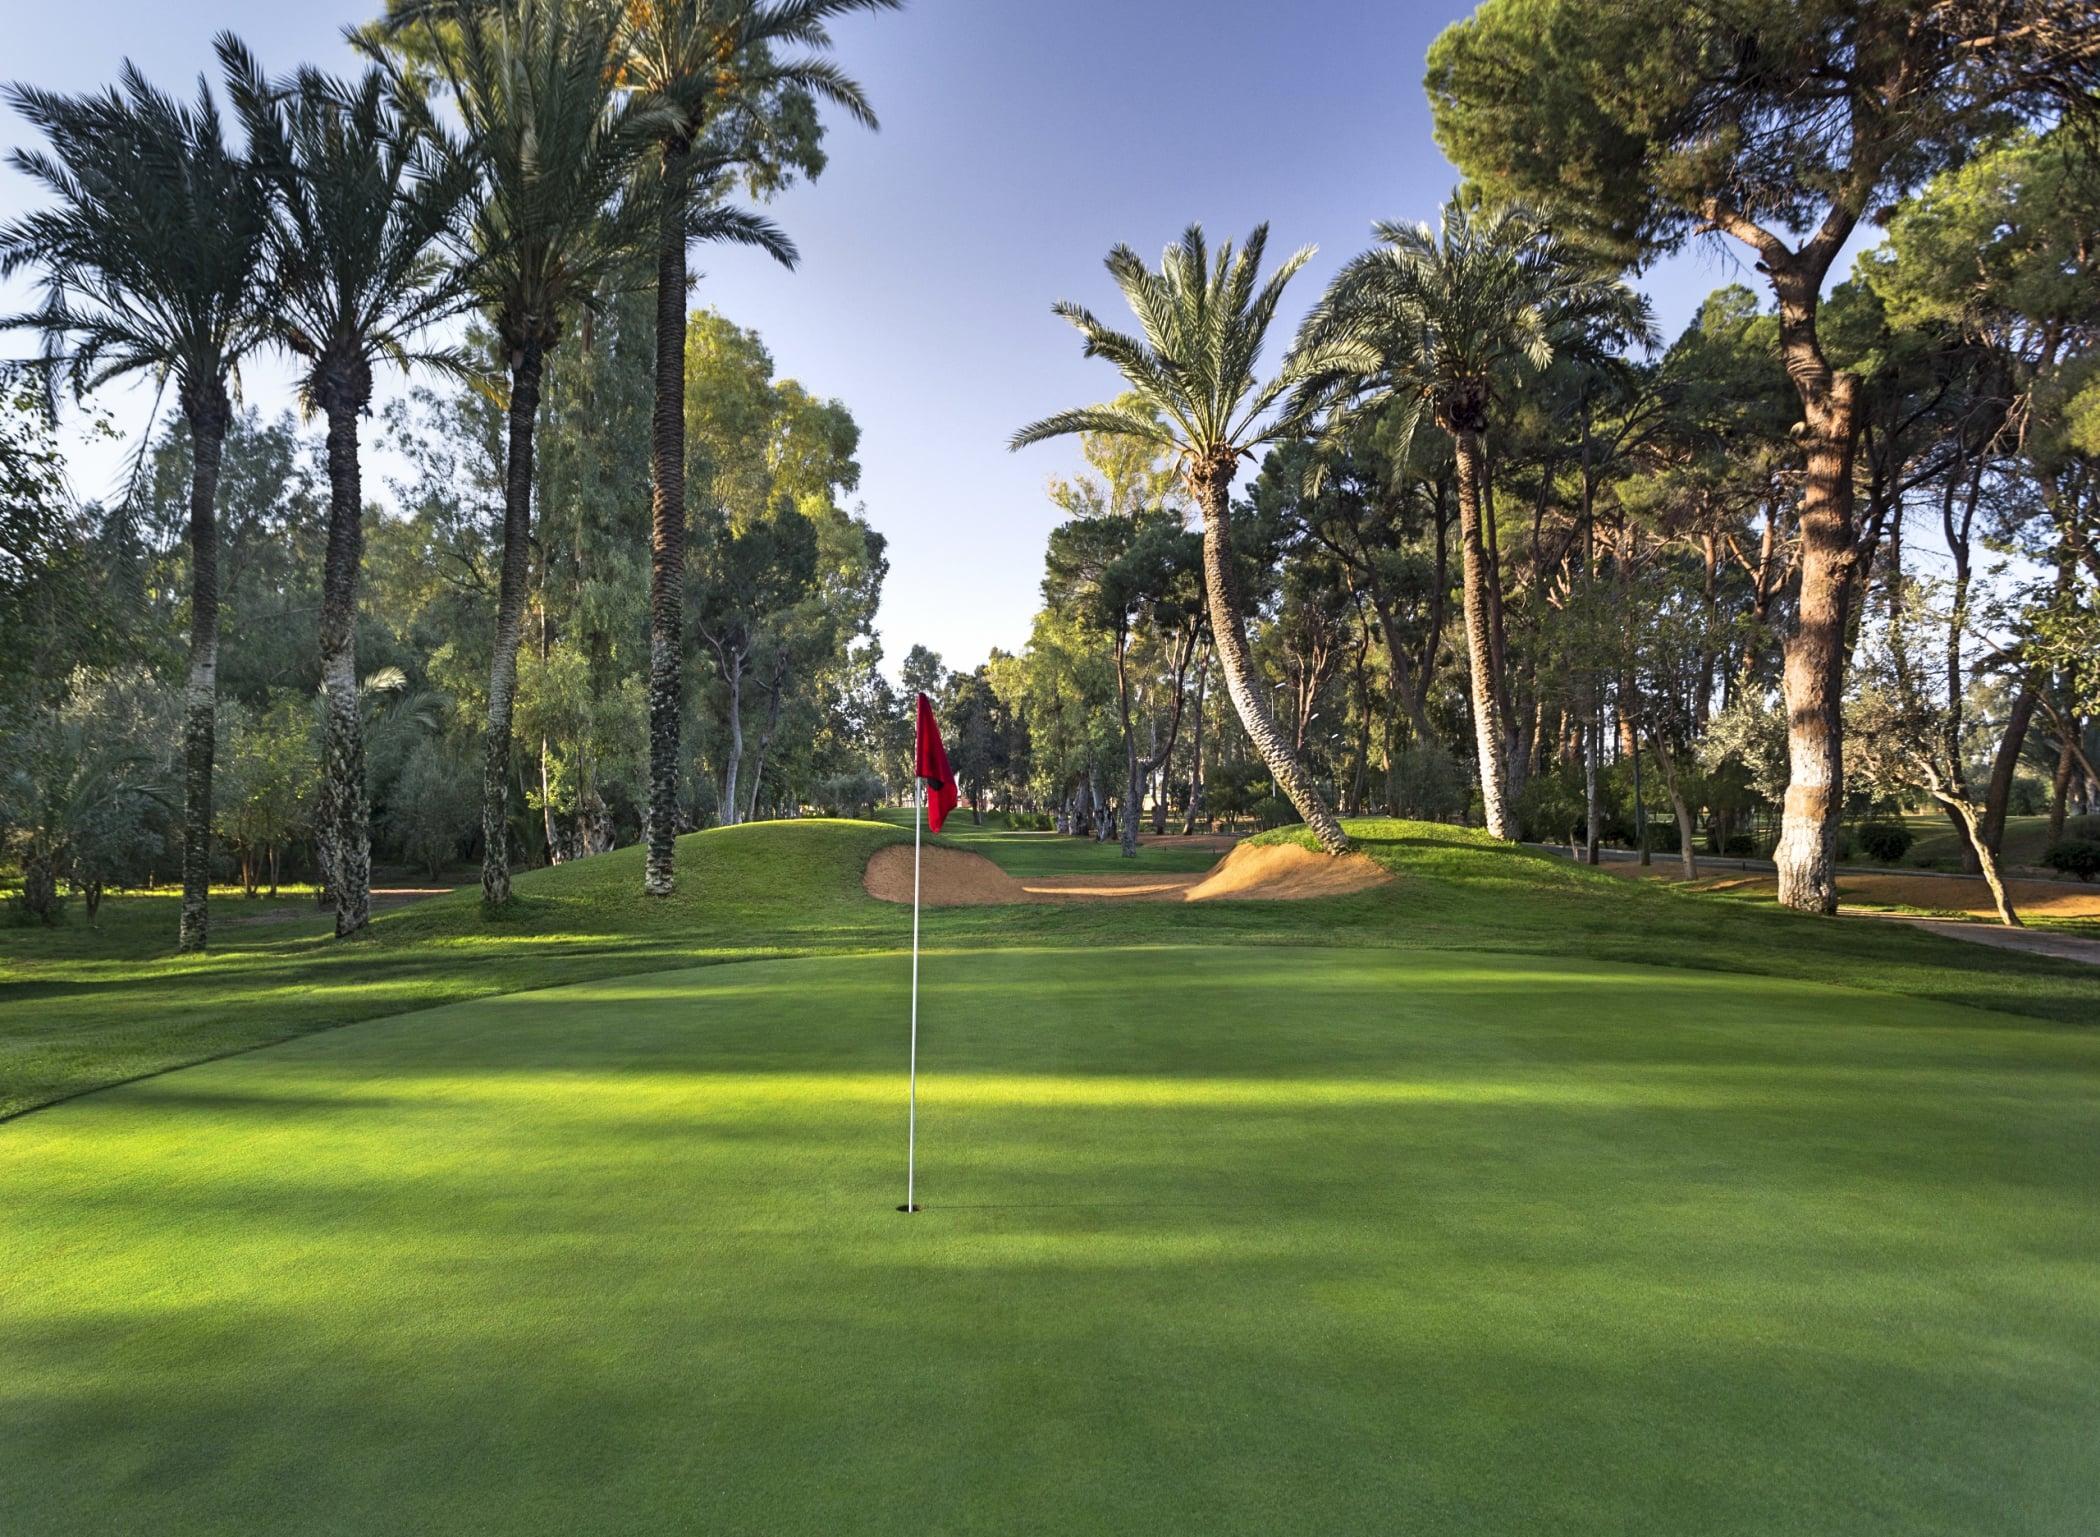 Amanjena_Morocco_Marrakech_Golf_fivestardestination_five_star_destination_5